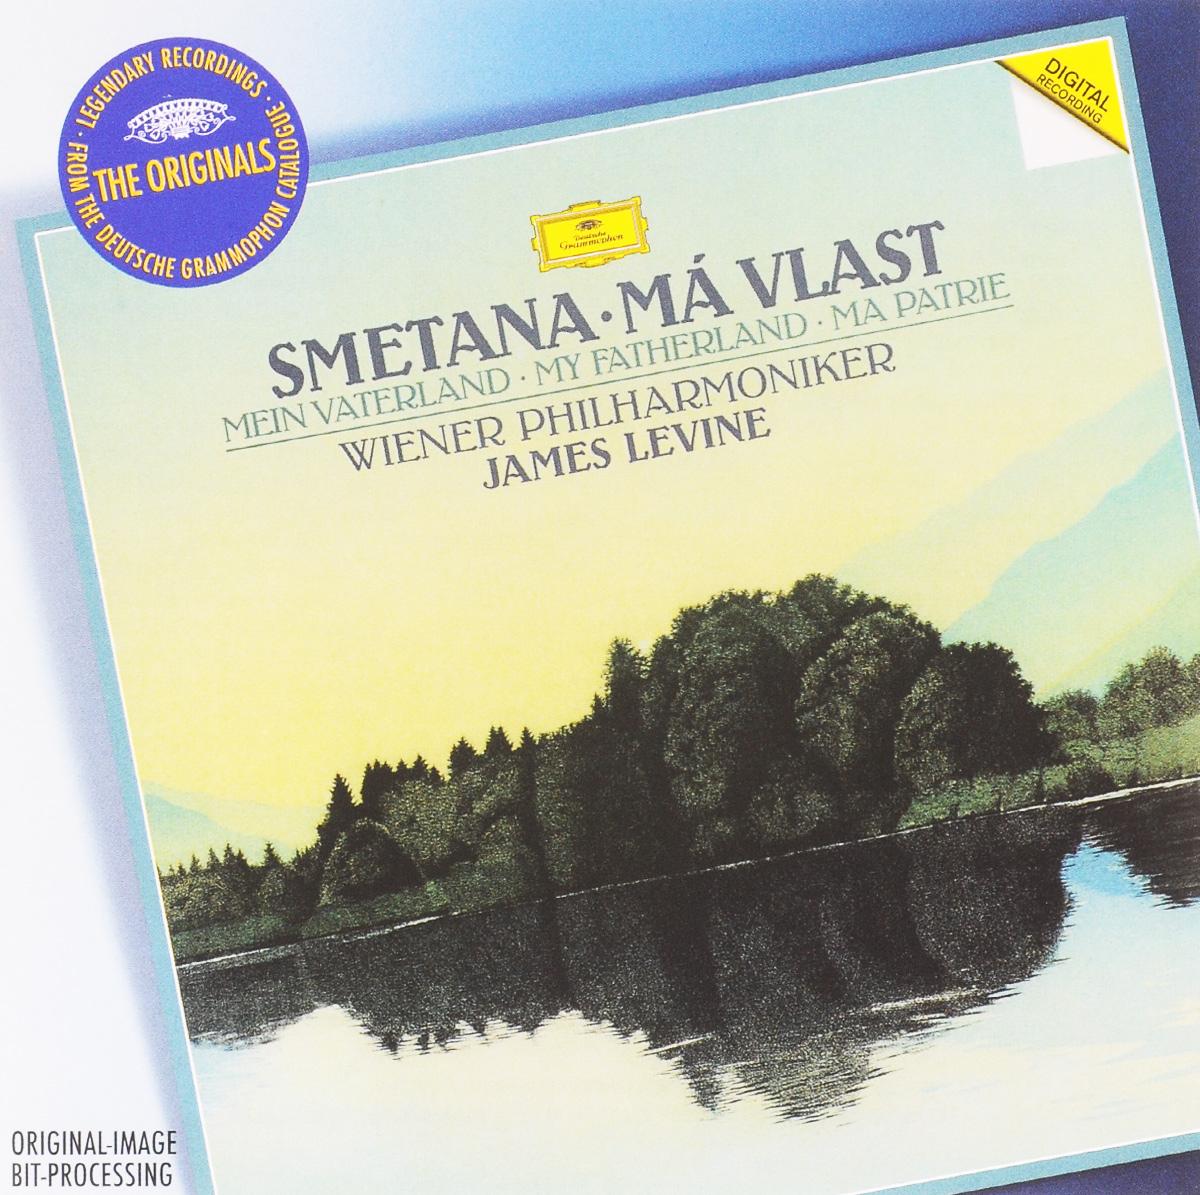 Джеймс Левайн,Wiener Singverein - Wiener Philharmoniker James Levine, Wiener Philharmoniker. Smetana. Ma Vlast